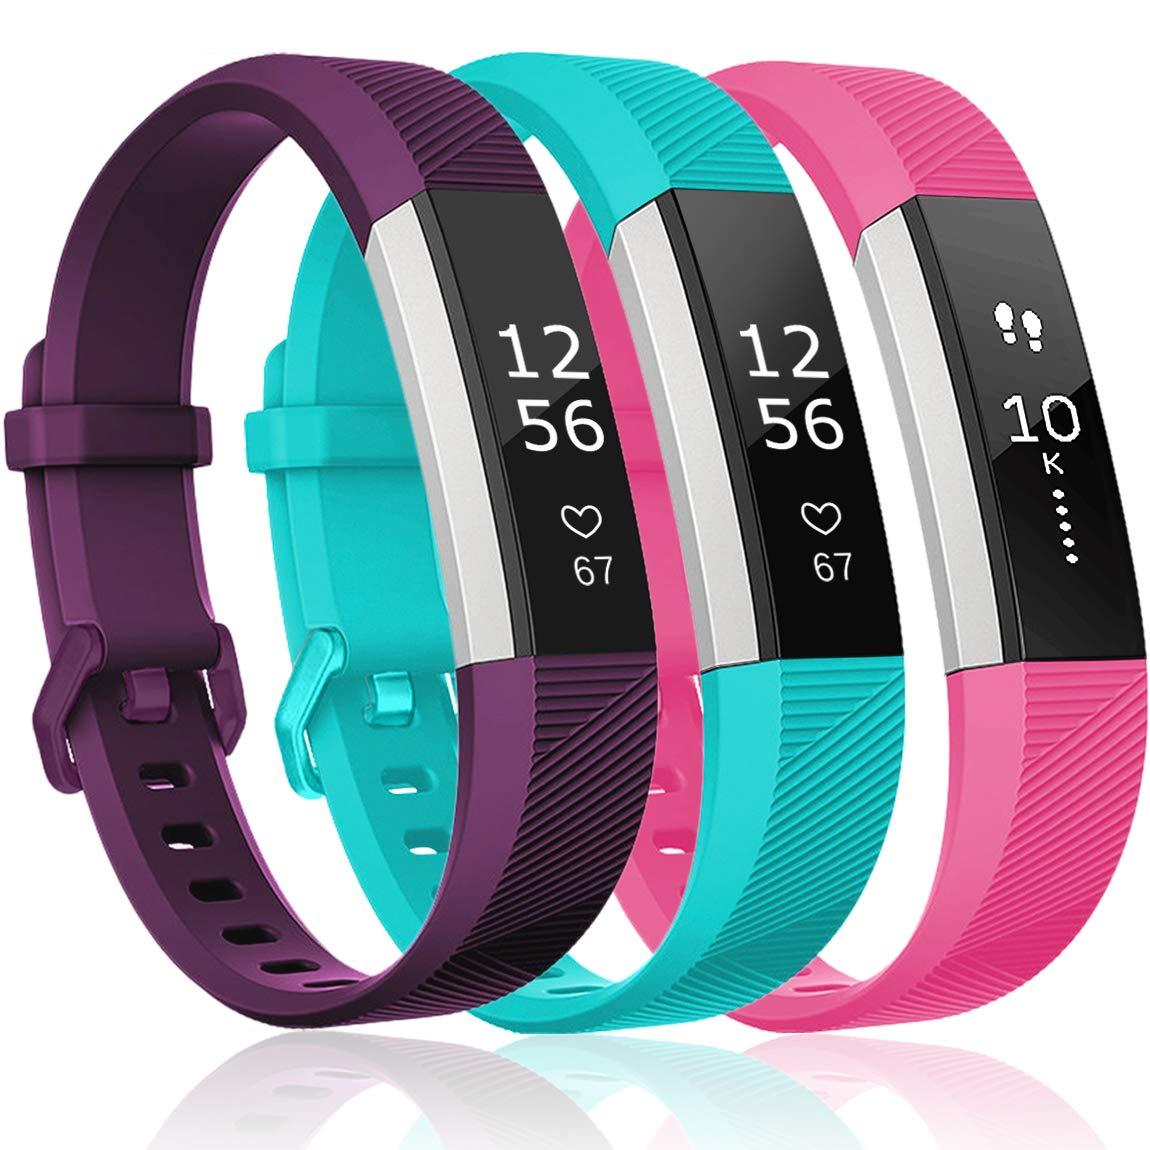 Mallas Para Reloj Fitbit Alta, Alta Hr Y Fitbit Ace (x3)